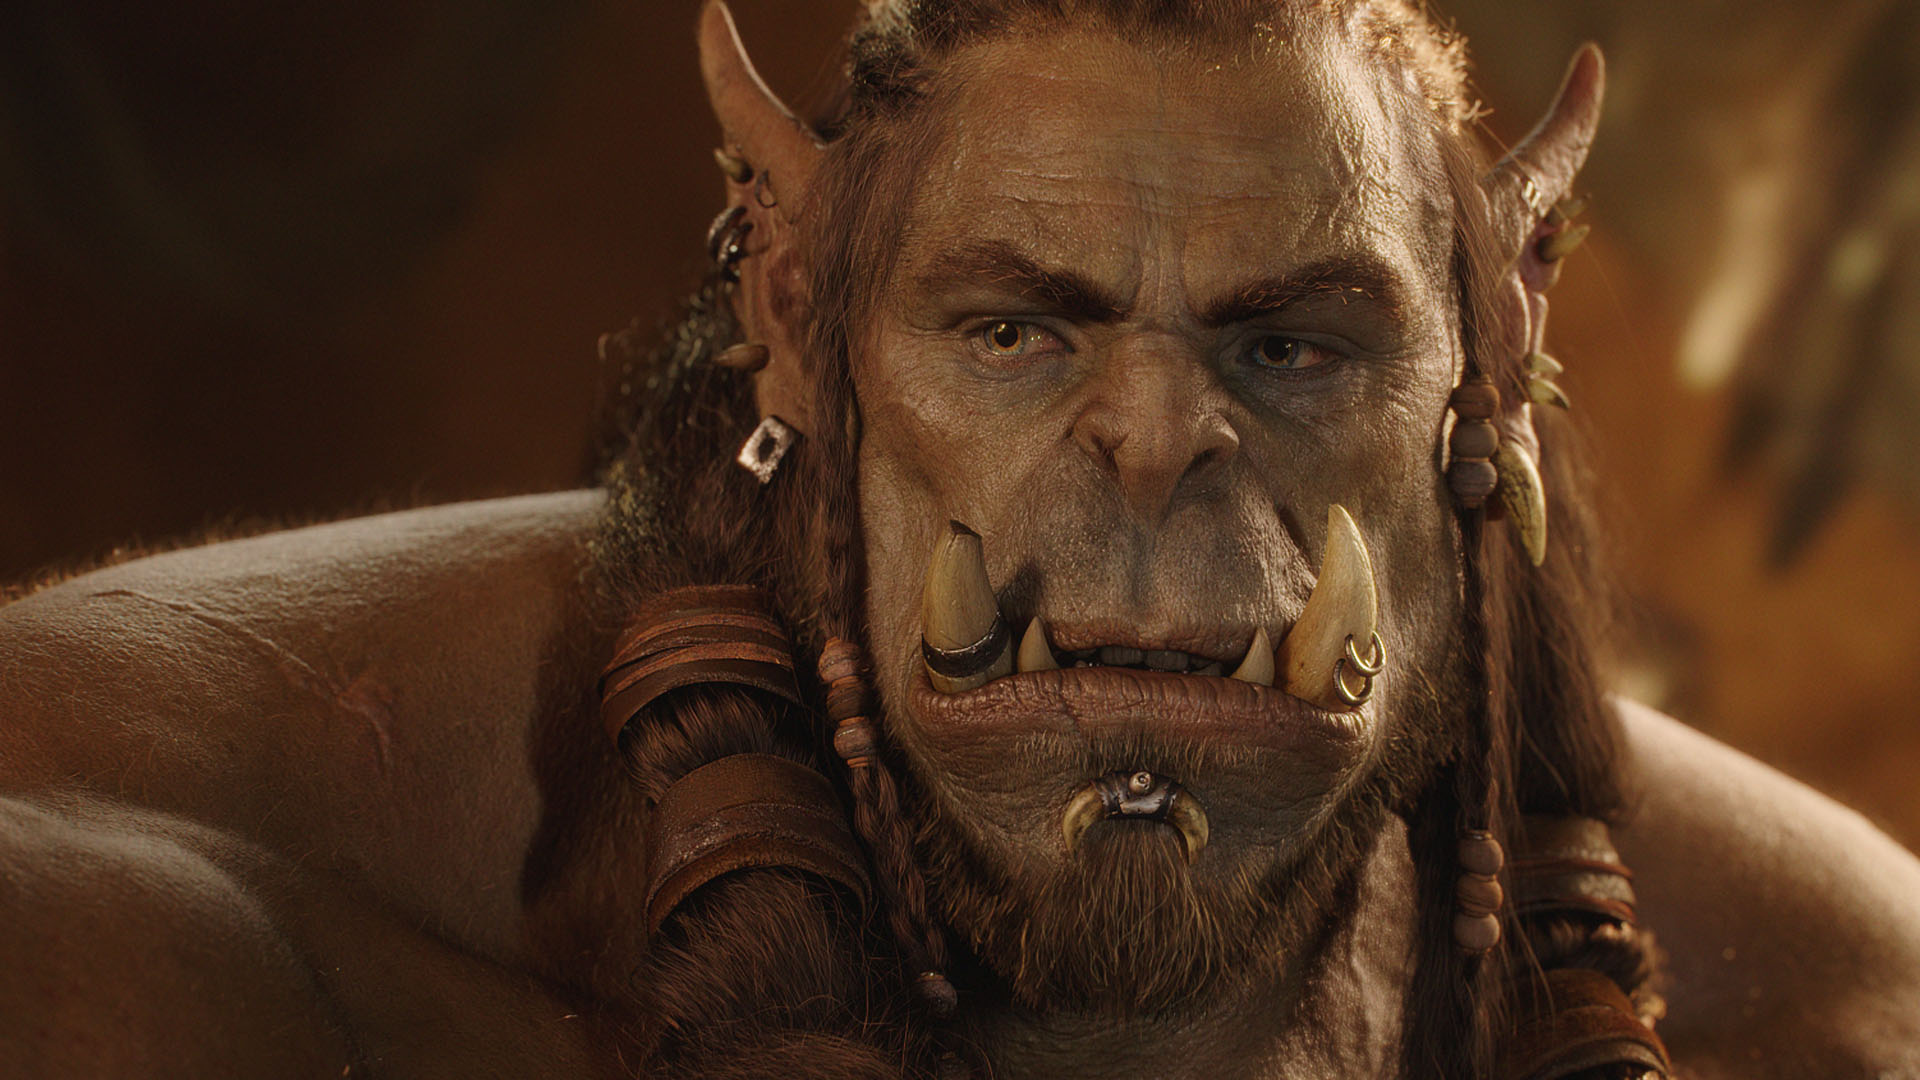 Durotan from Warcraft